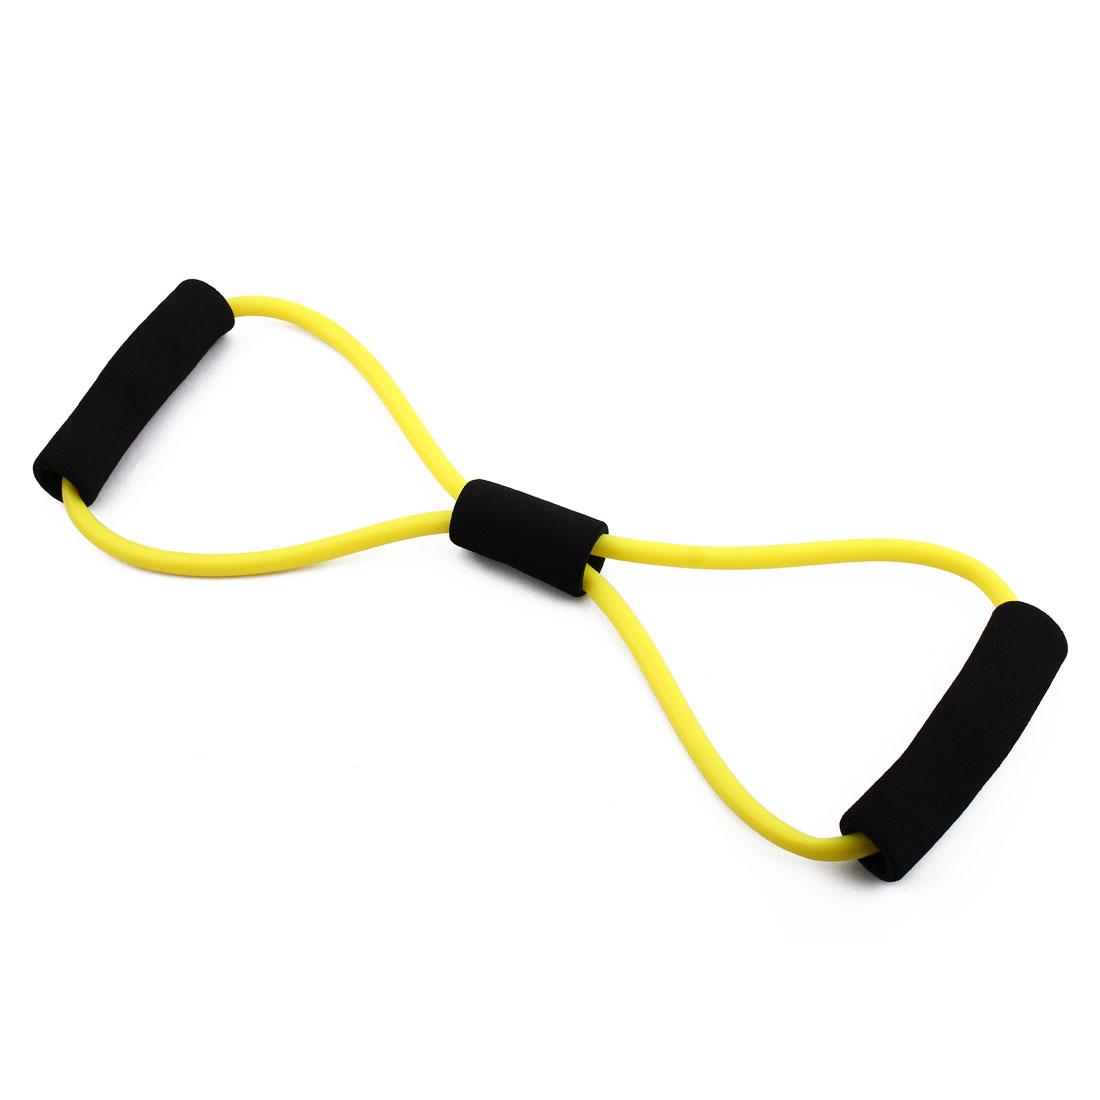 Gymnasium 8 Shape Powerlifting Workout Resistance Tube Strength Training Rope Fitness Exercise Hose Yellow